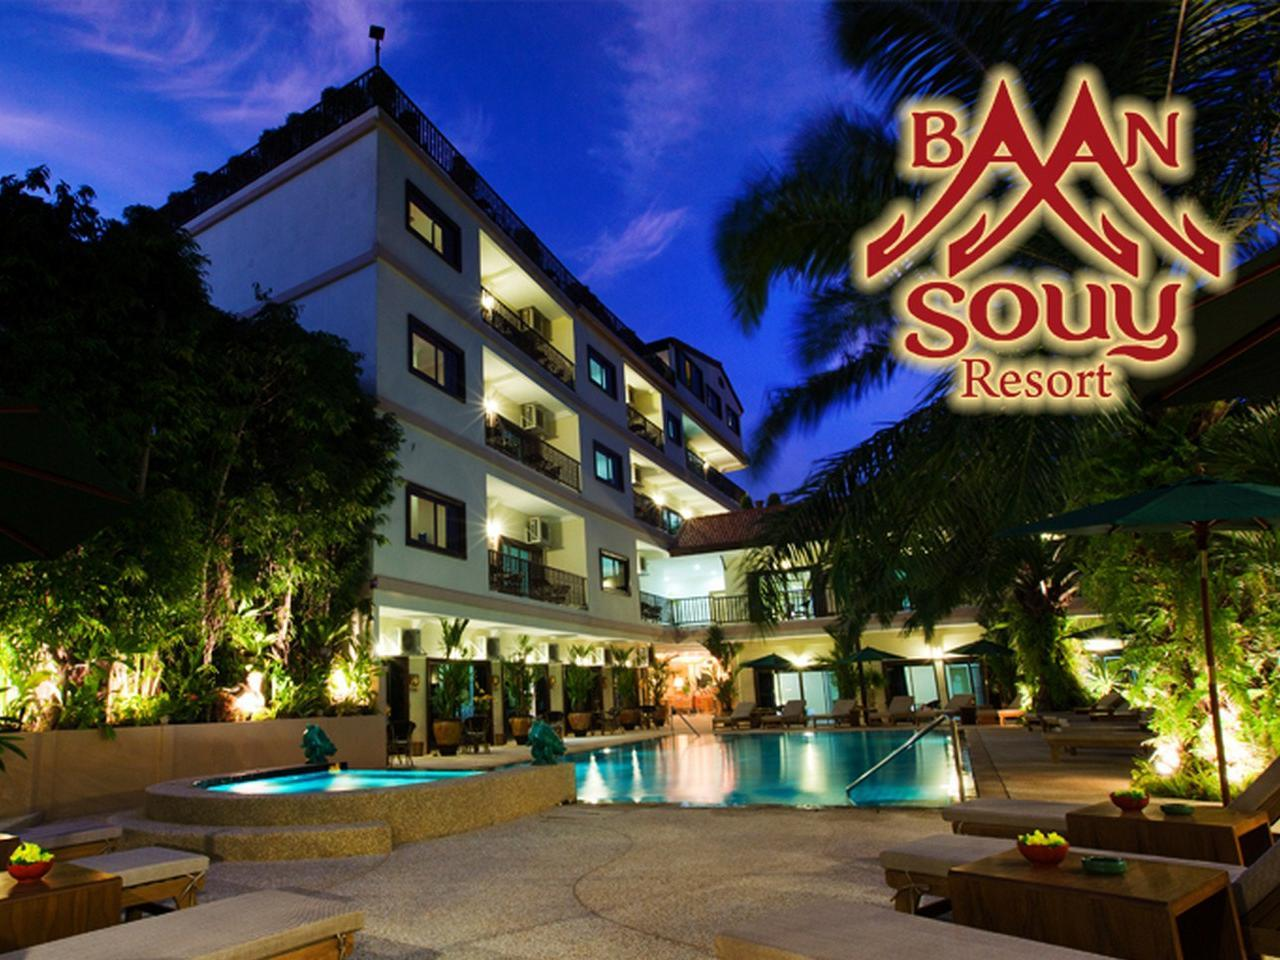 Baan Souy Resort - Pattaya